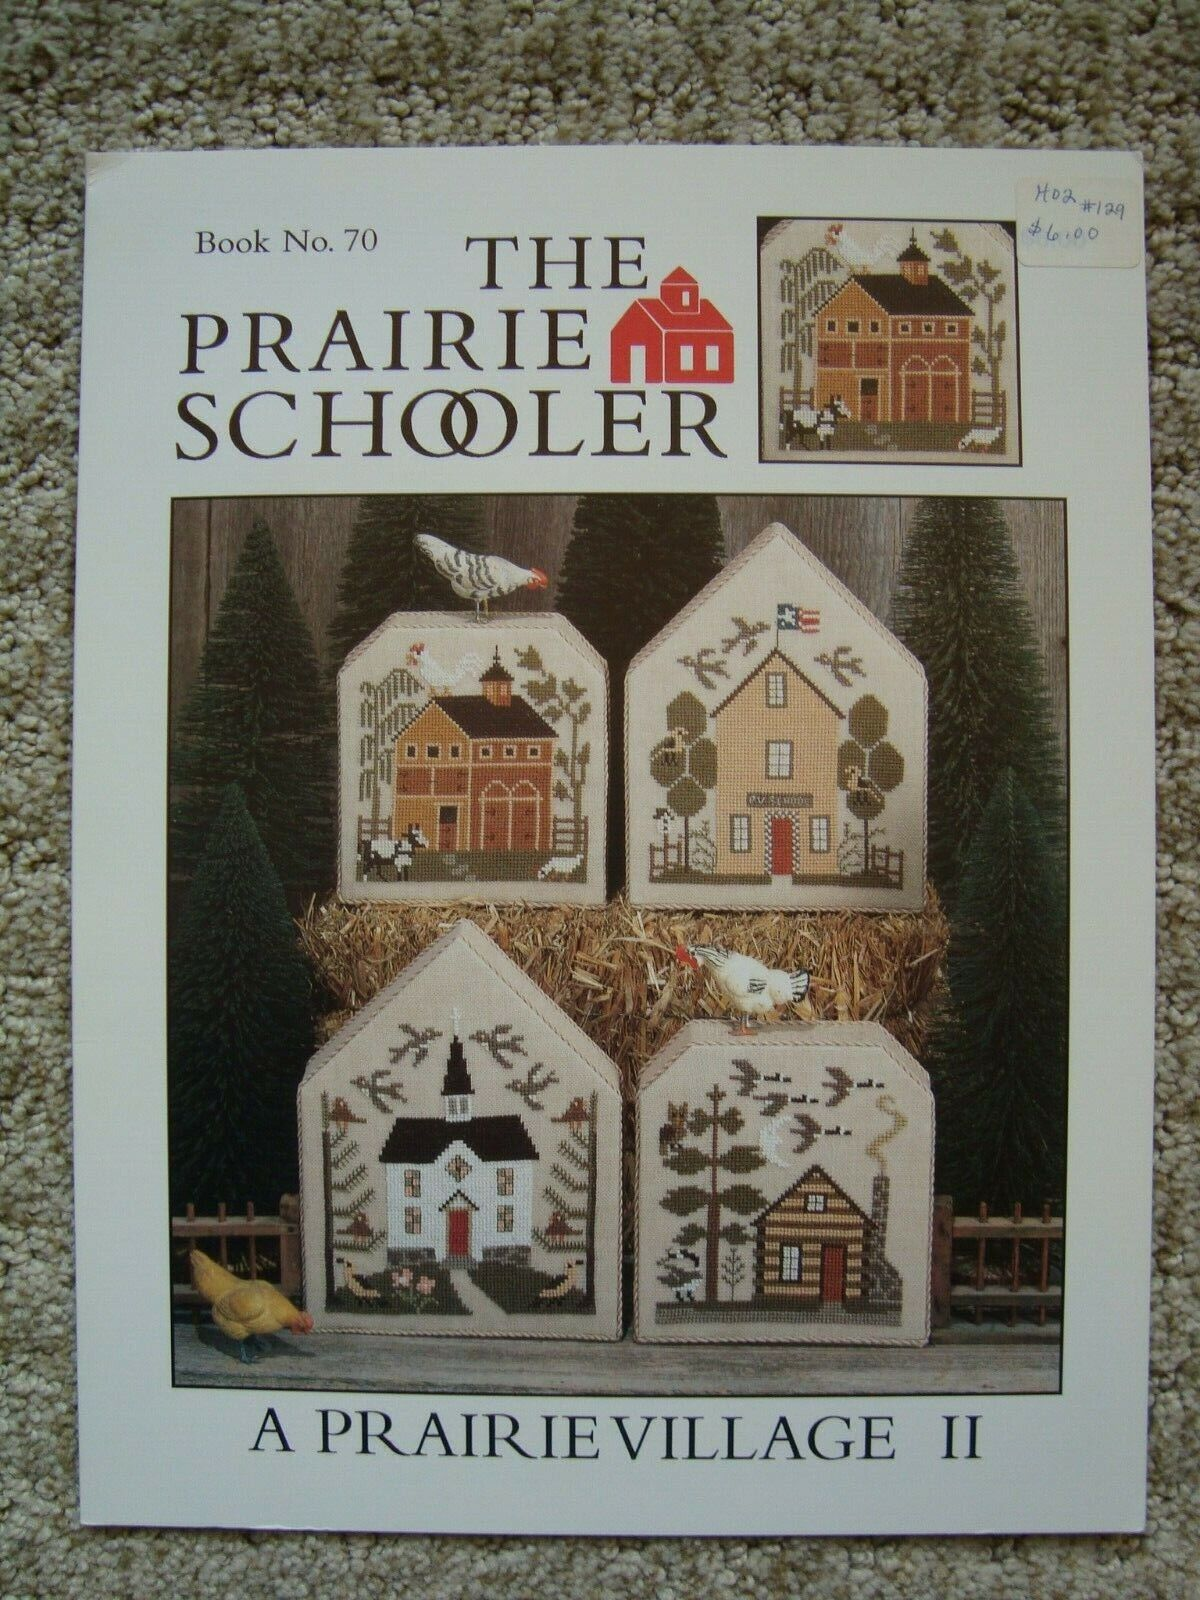 41 counted cross stitch patterns Original Book The Prairie Schooler Still Life Book No